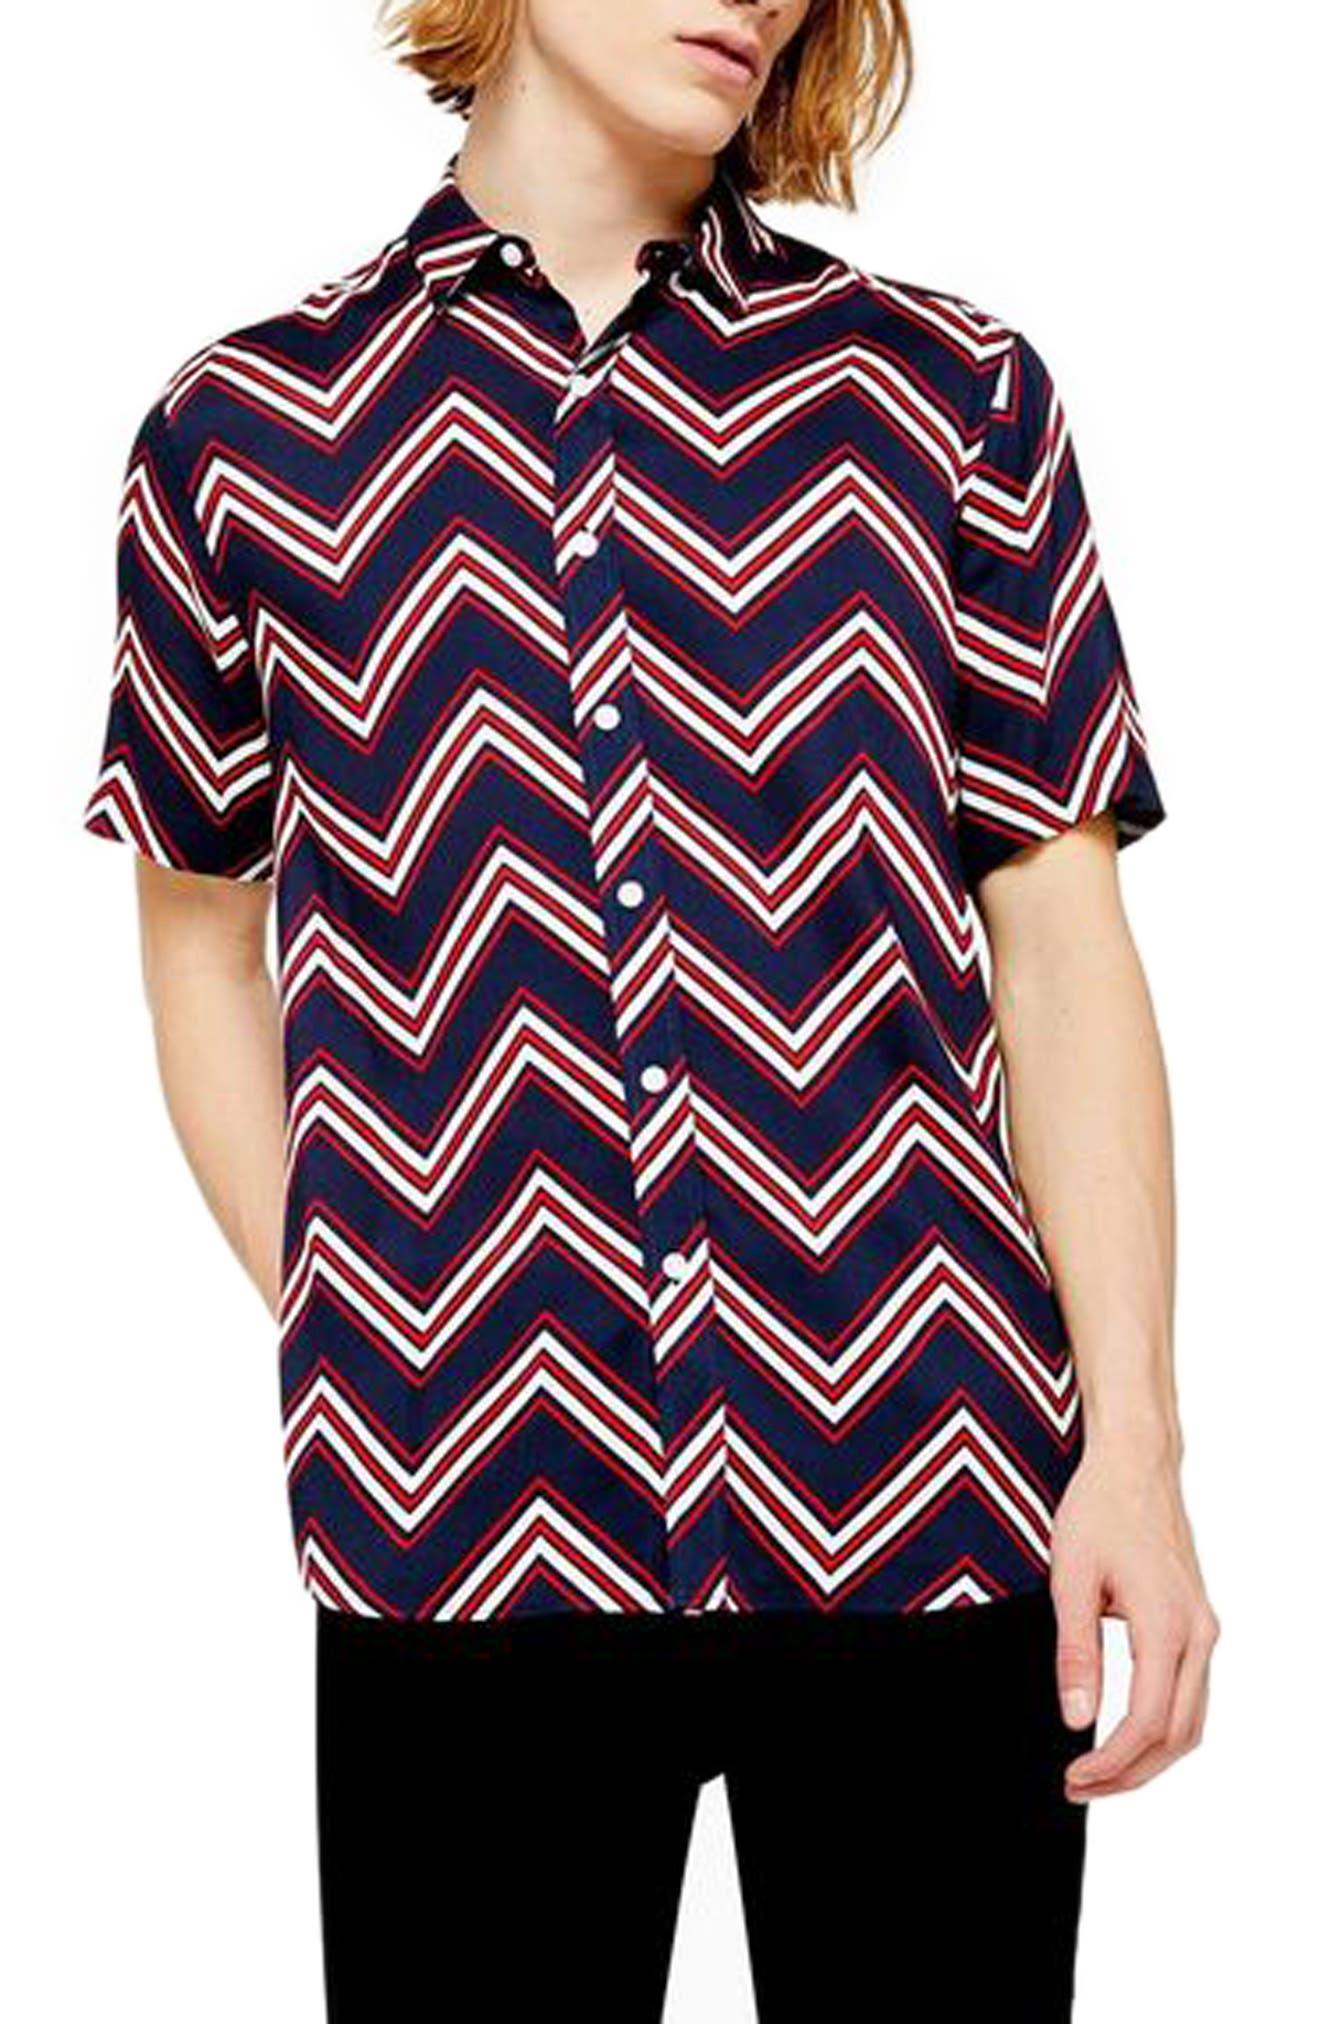 1960s – 70s Mens Shirts- Disco Shirts, Hippie Shirts Mens Topman Chevron Shirt $27.50 AT vintagedancer.com